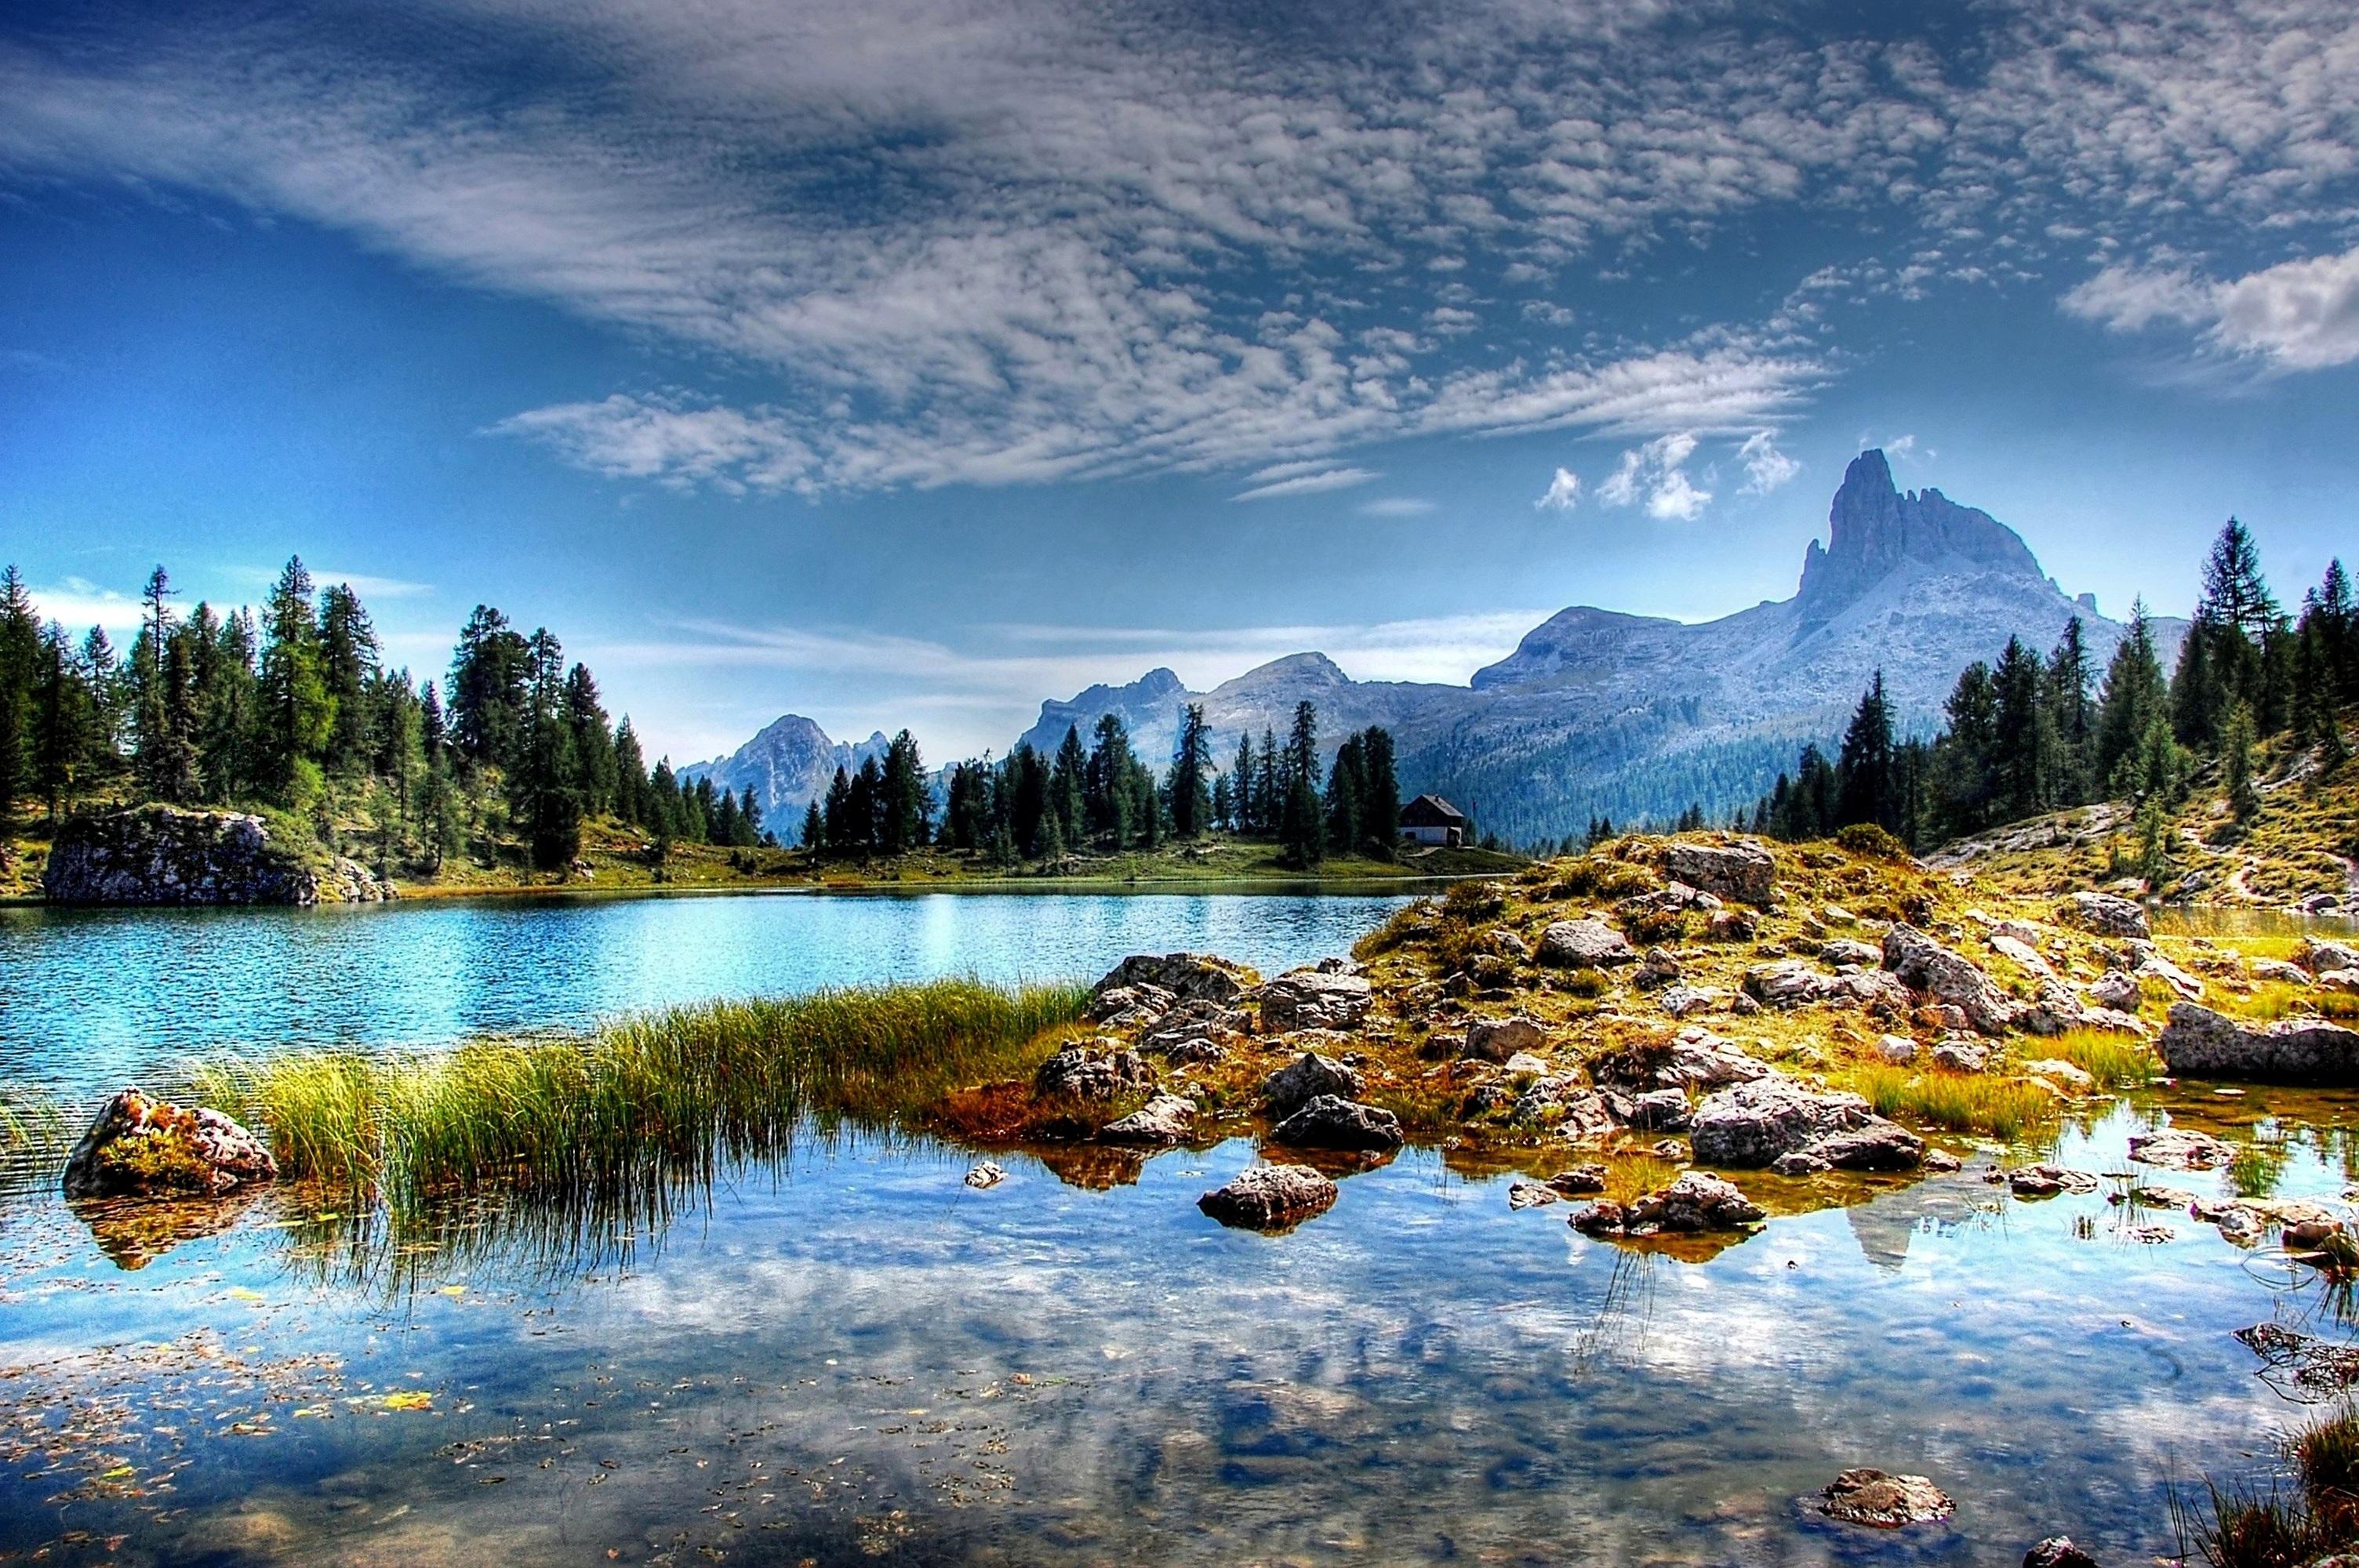 Gambar Pemandangan Pohon Batu Gurun Salju Cahaya Awan